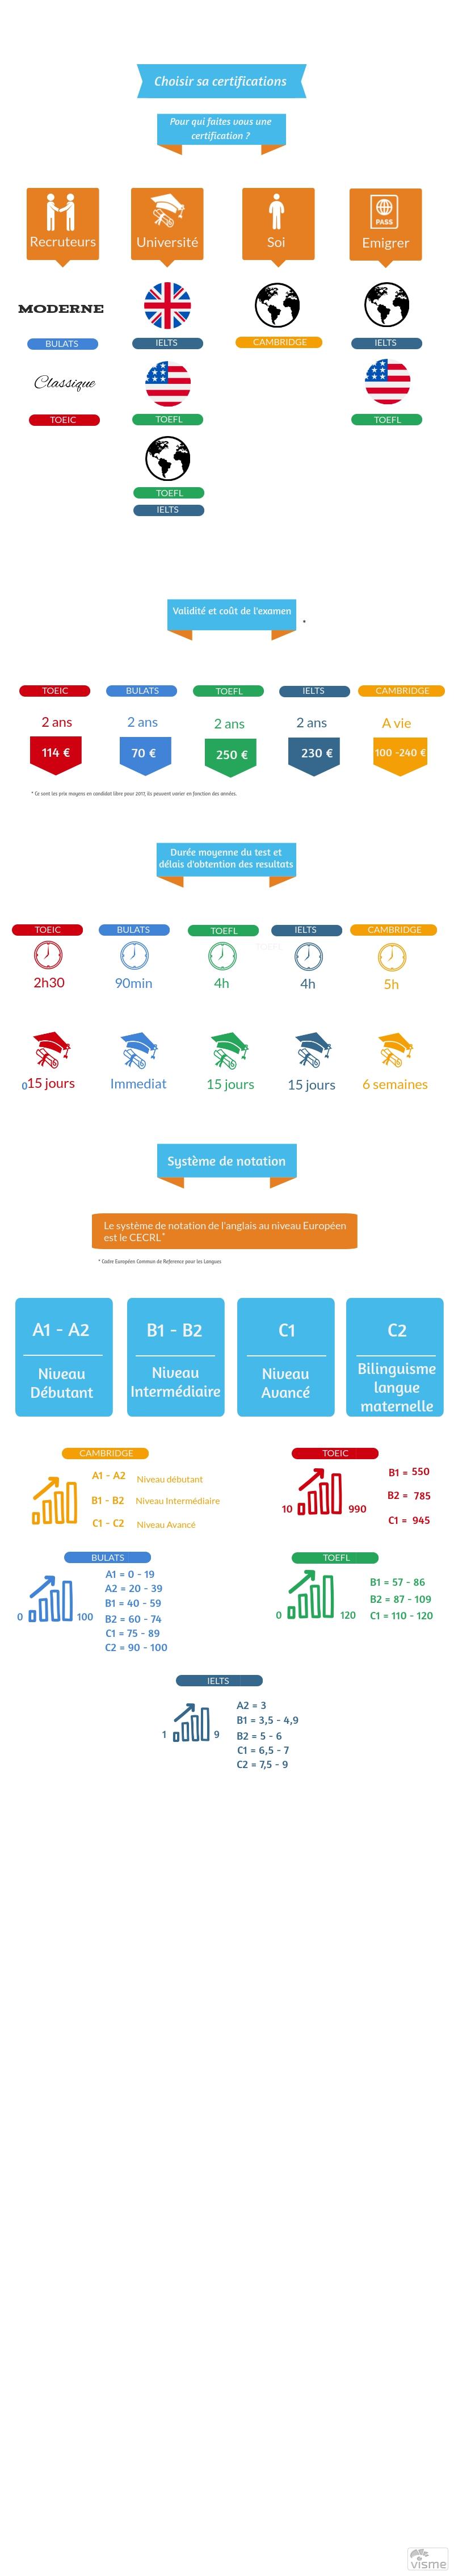 Infographie choix d'examens et tests d'anglais